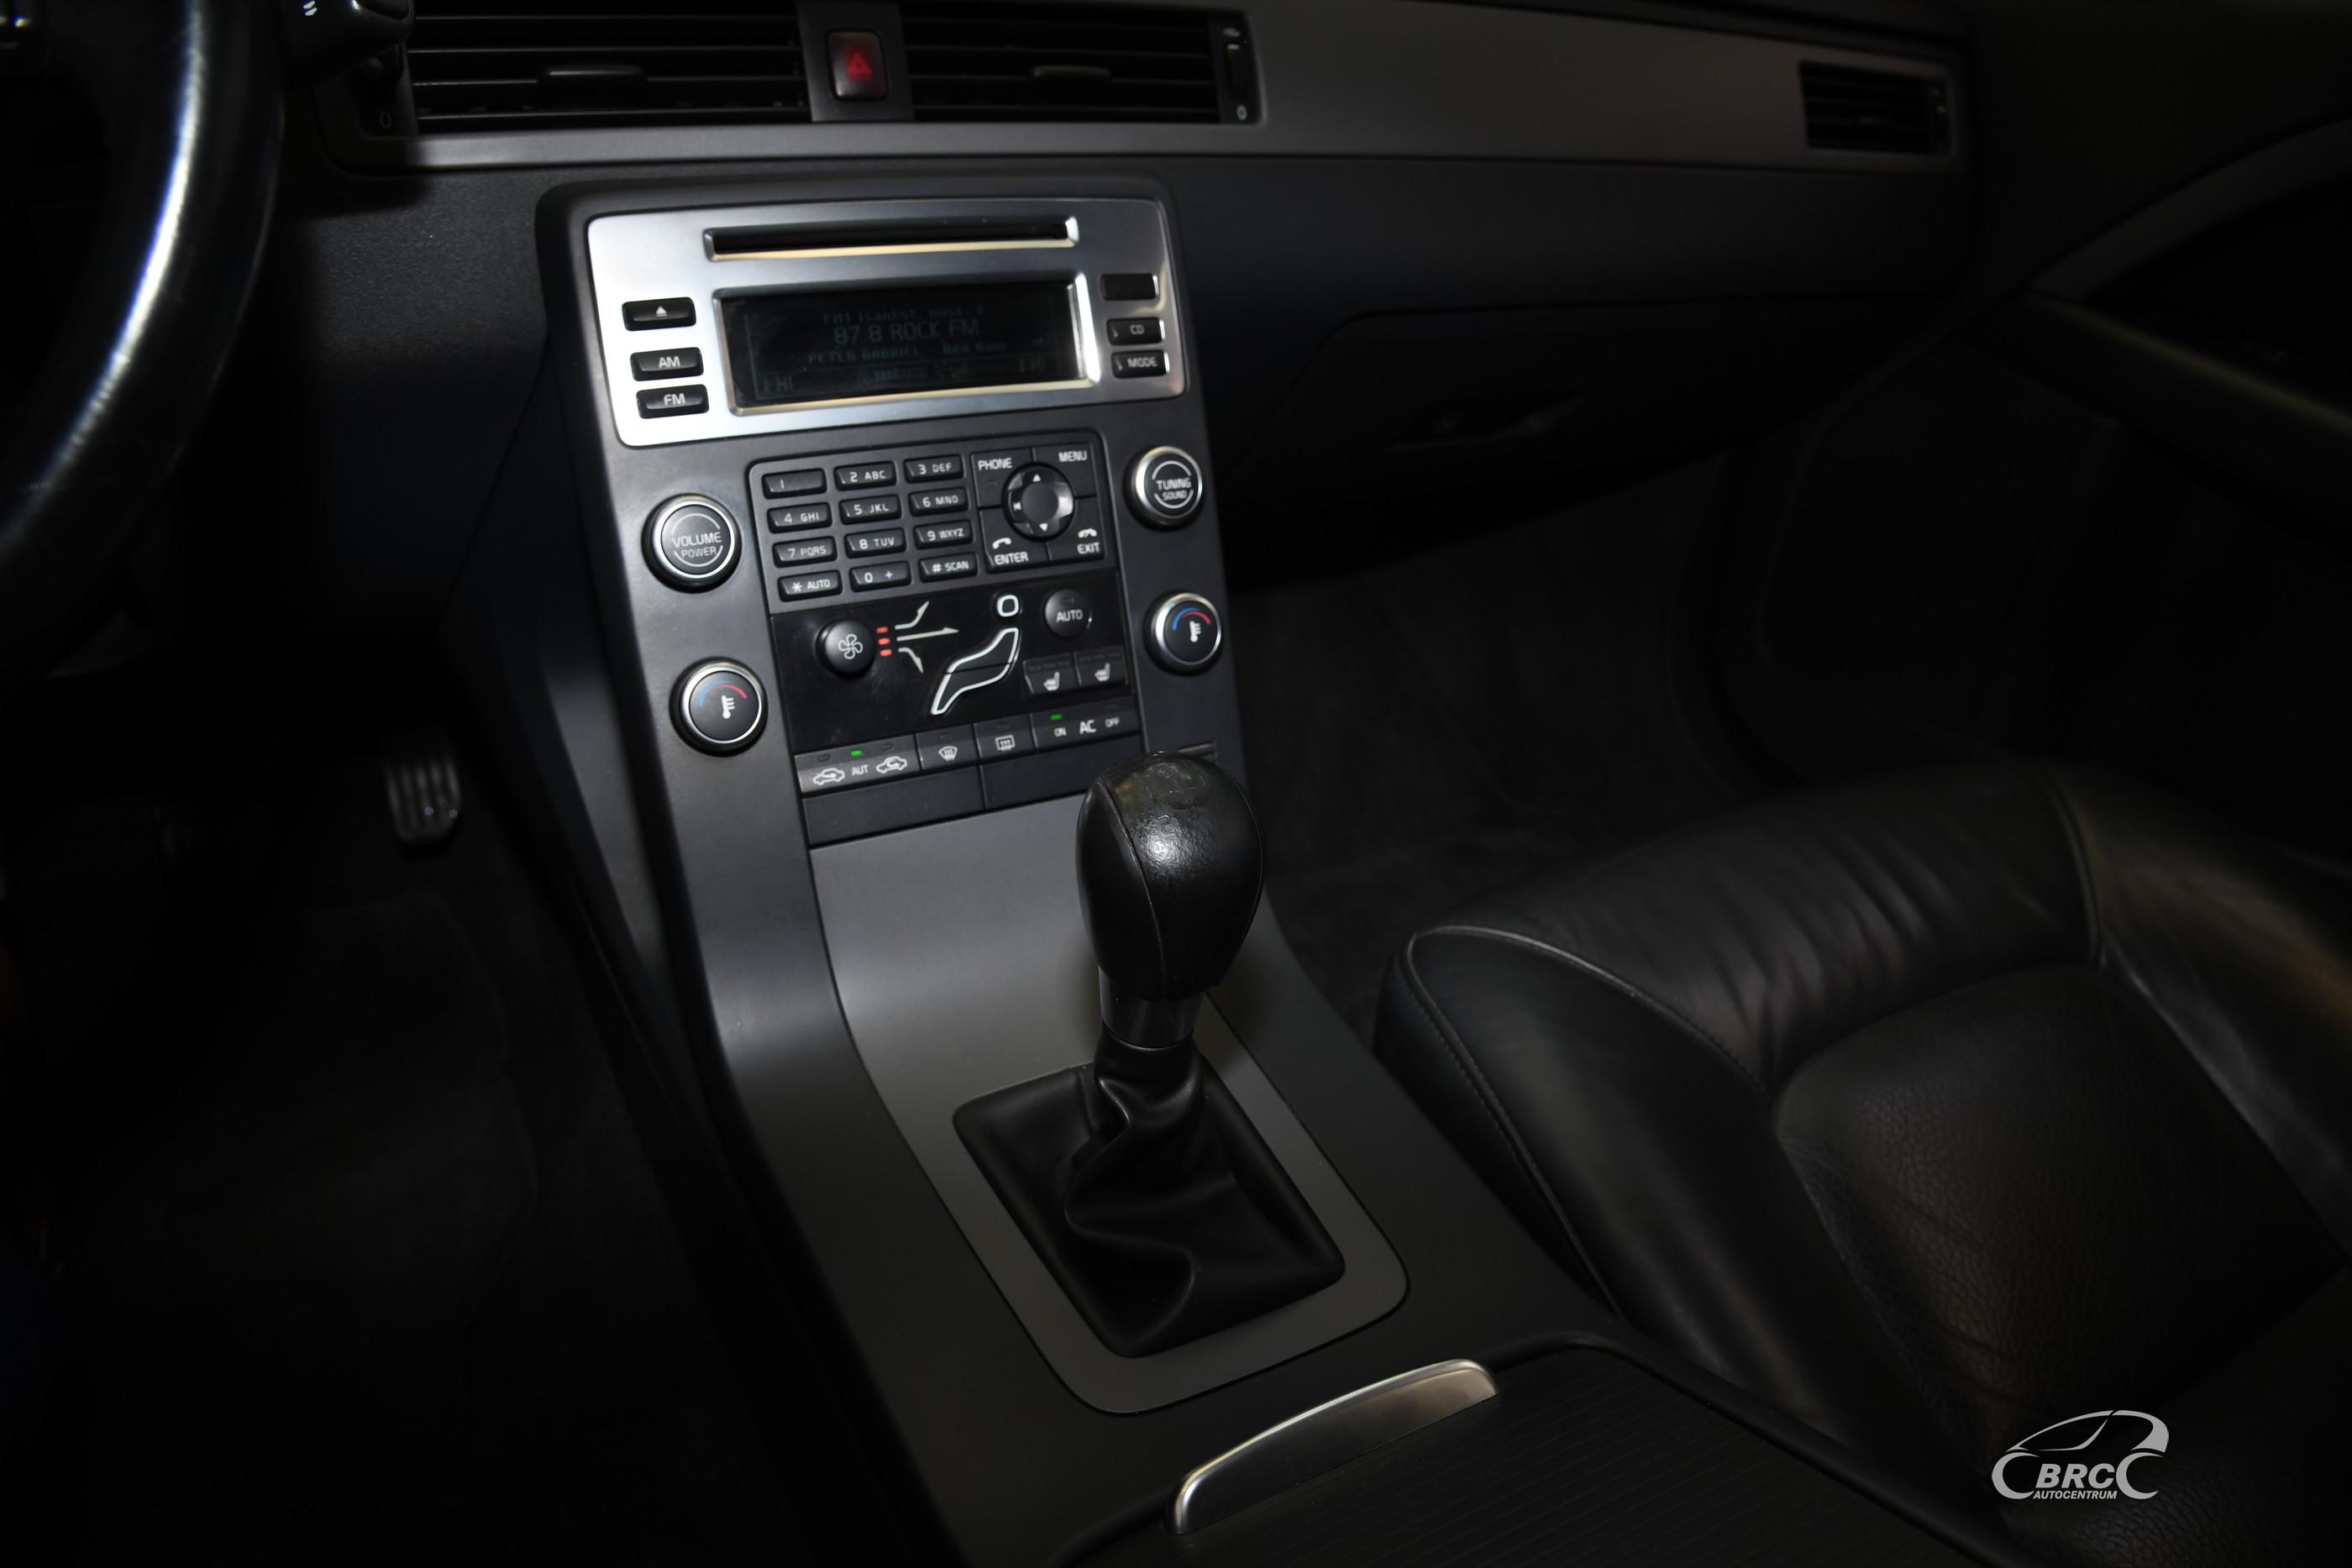 Volvo V70 1.6 DRIVe